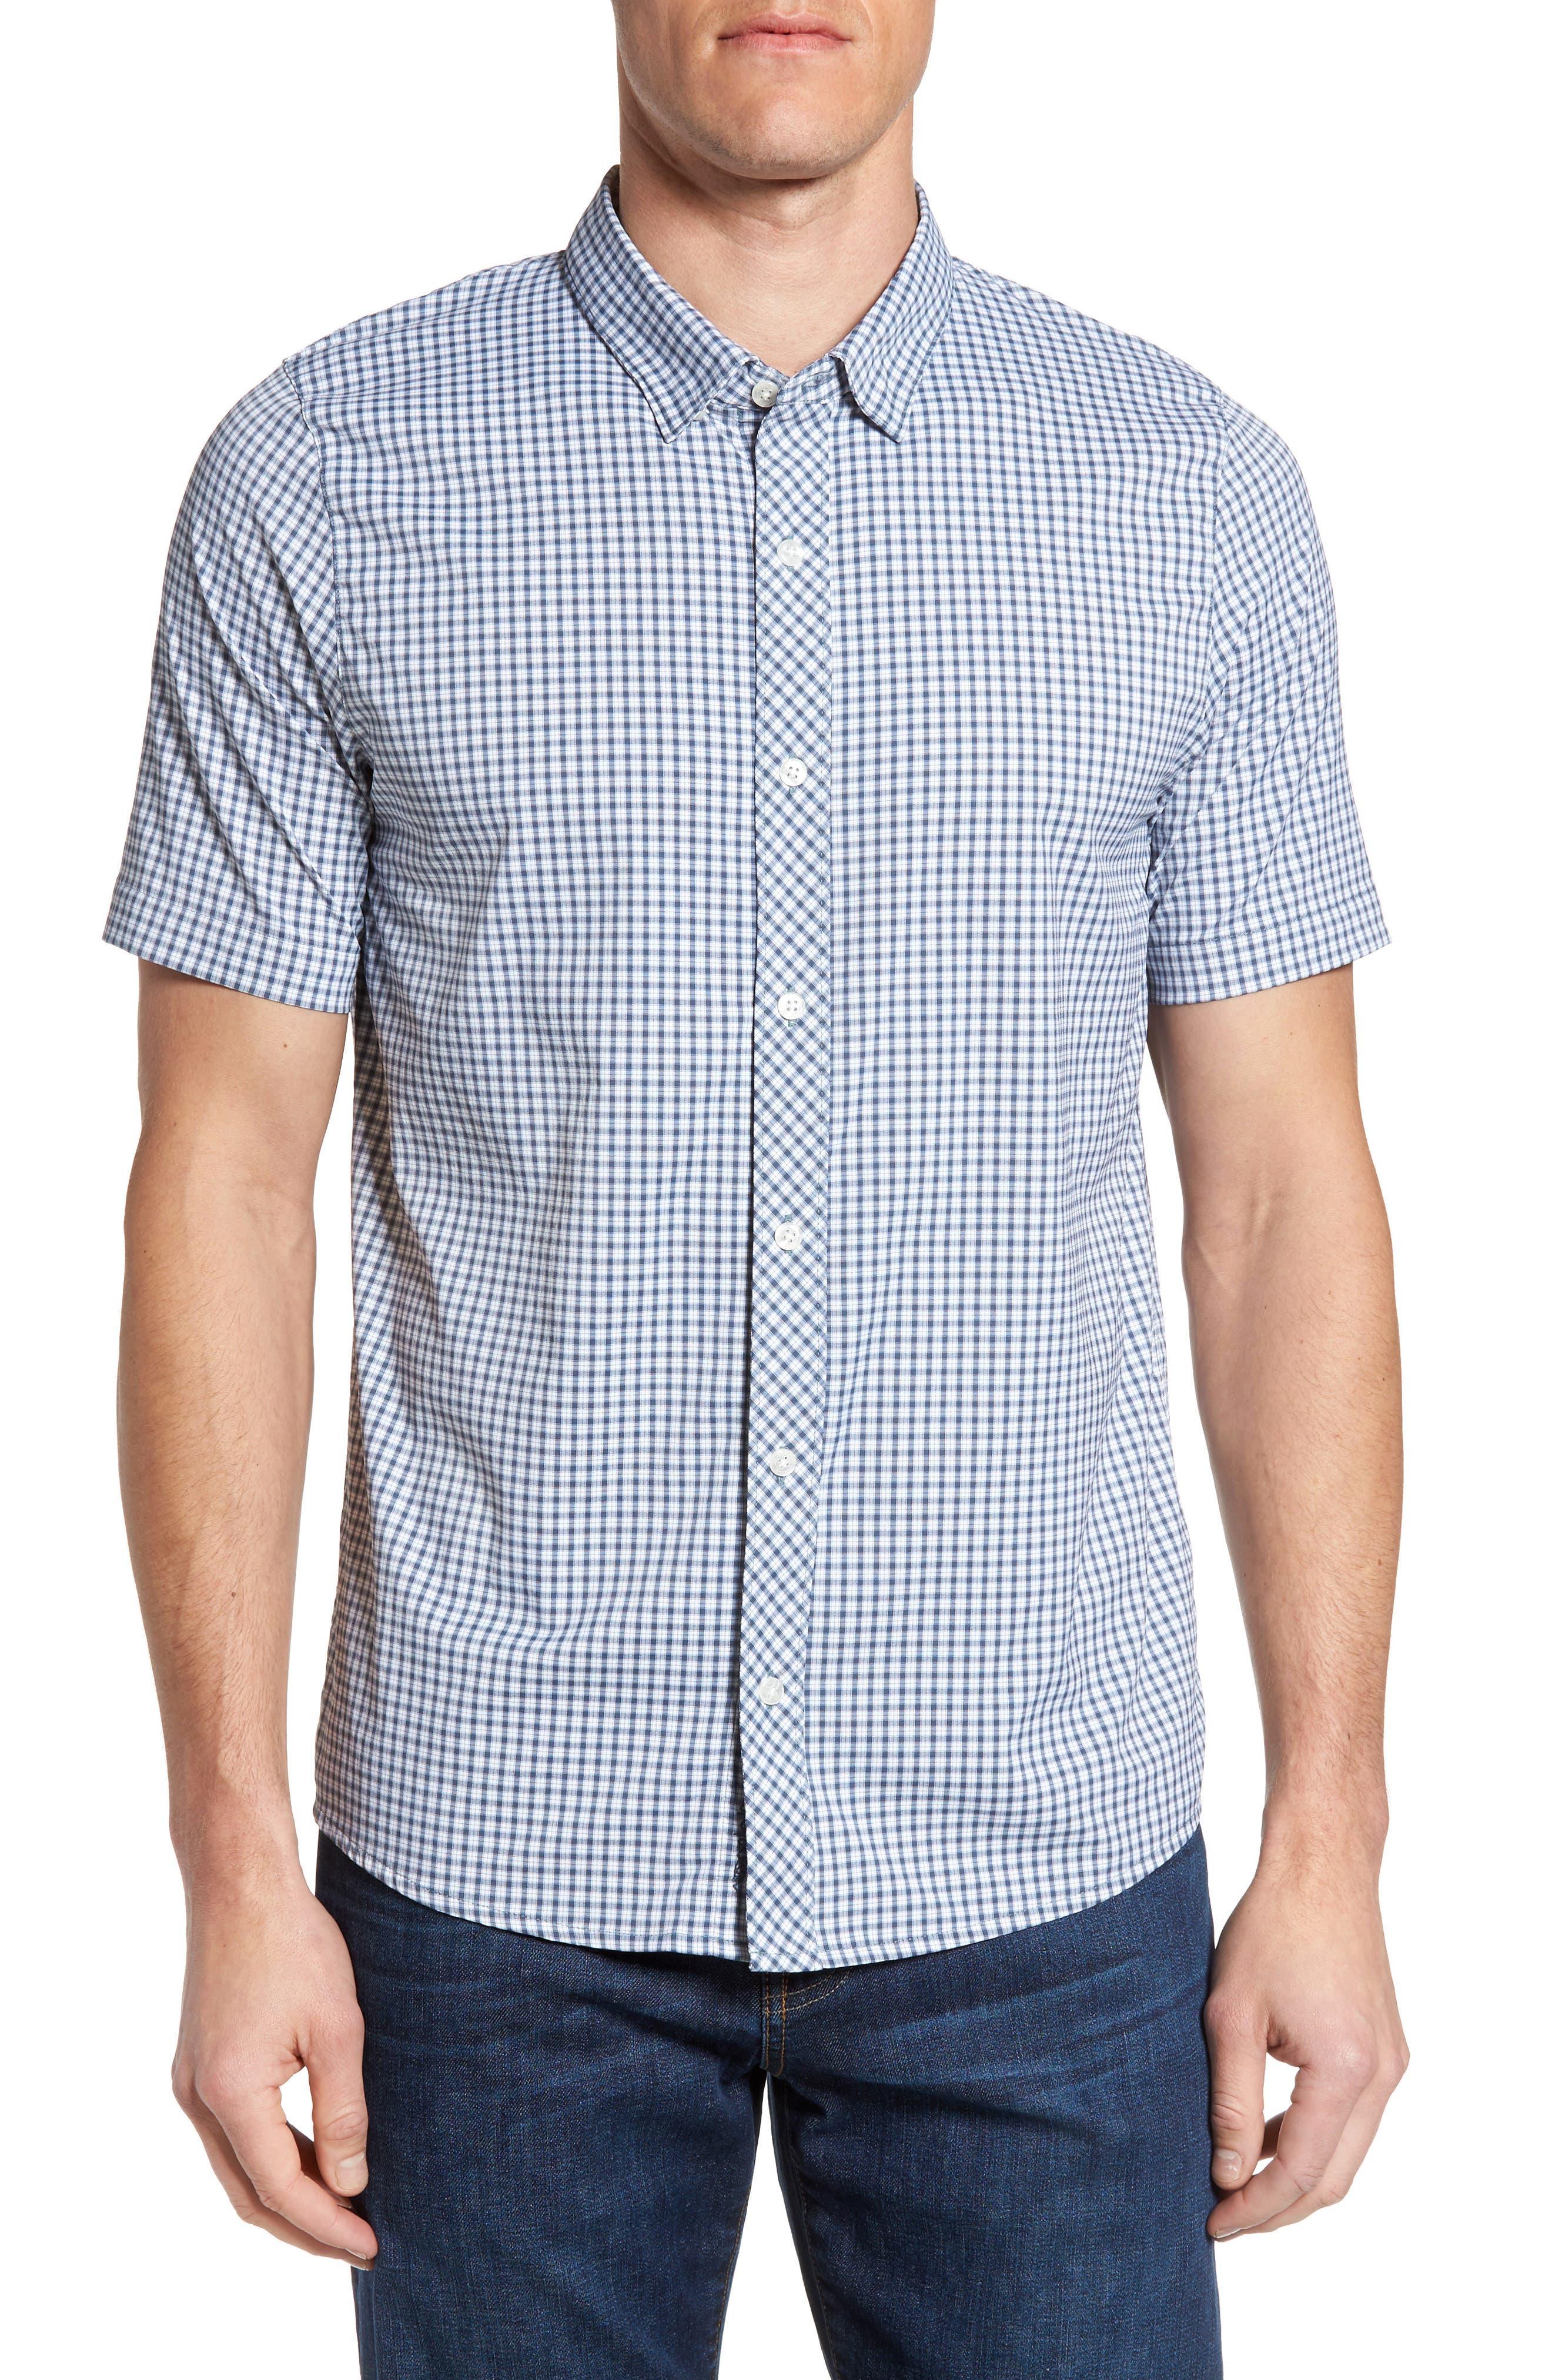 Alternate Image 1 Selected - Travis Mathew Barker Trim Fit Plaid Sport Shirt